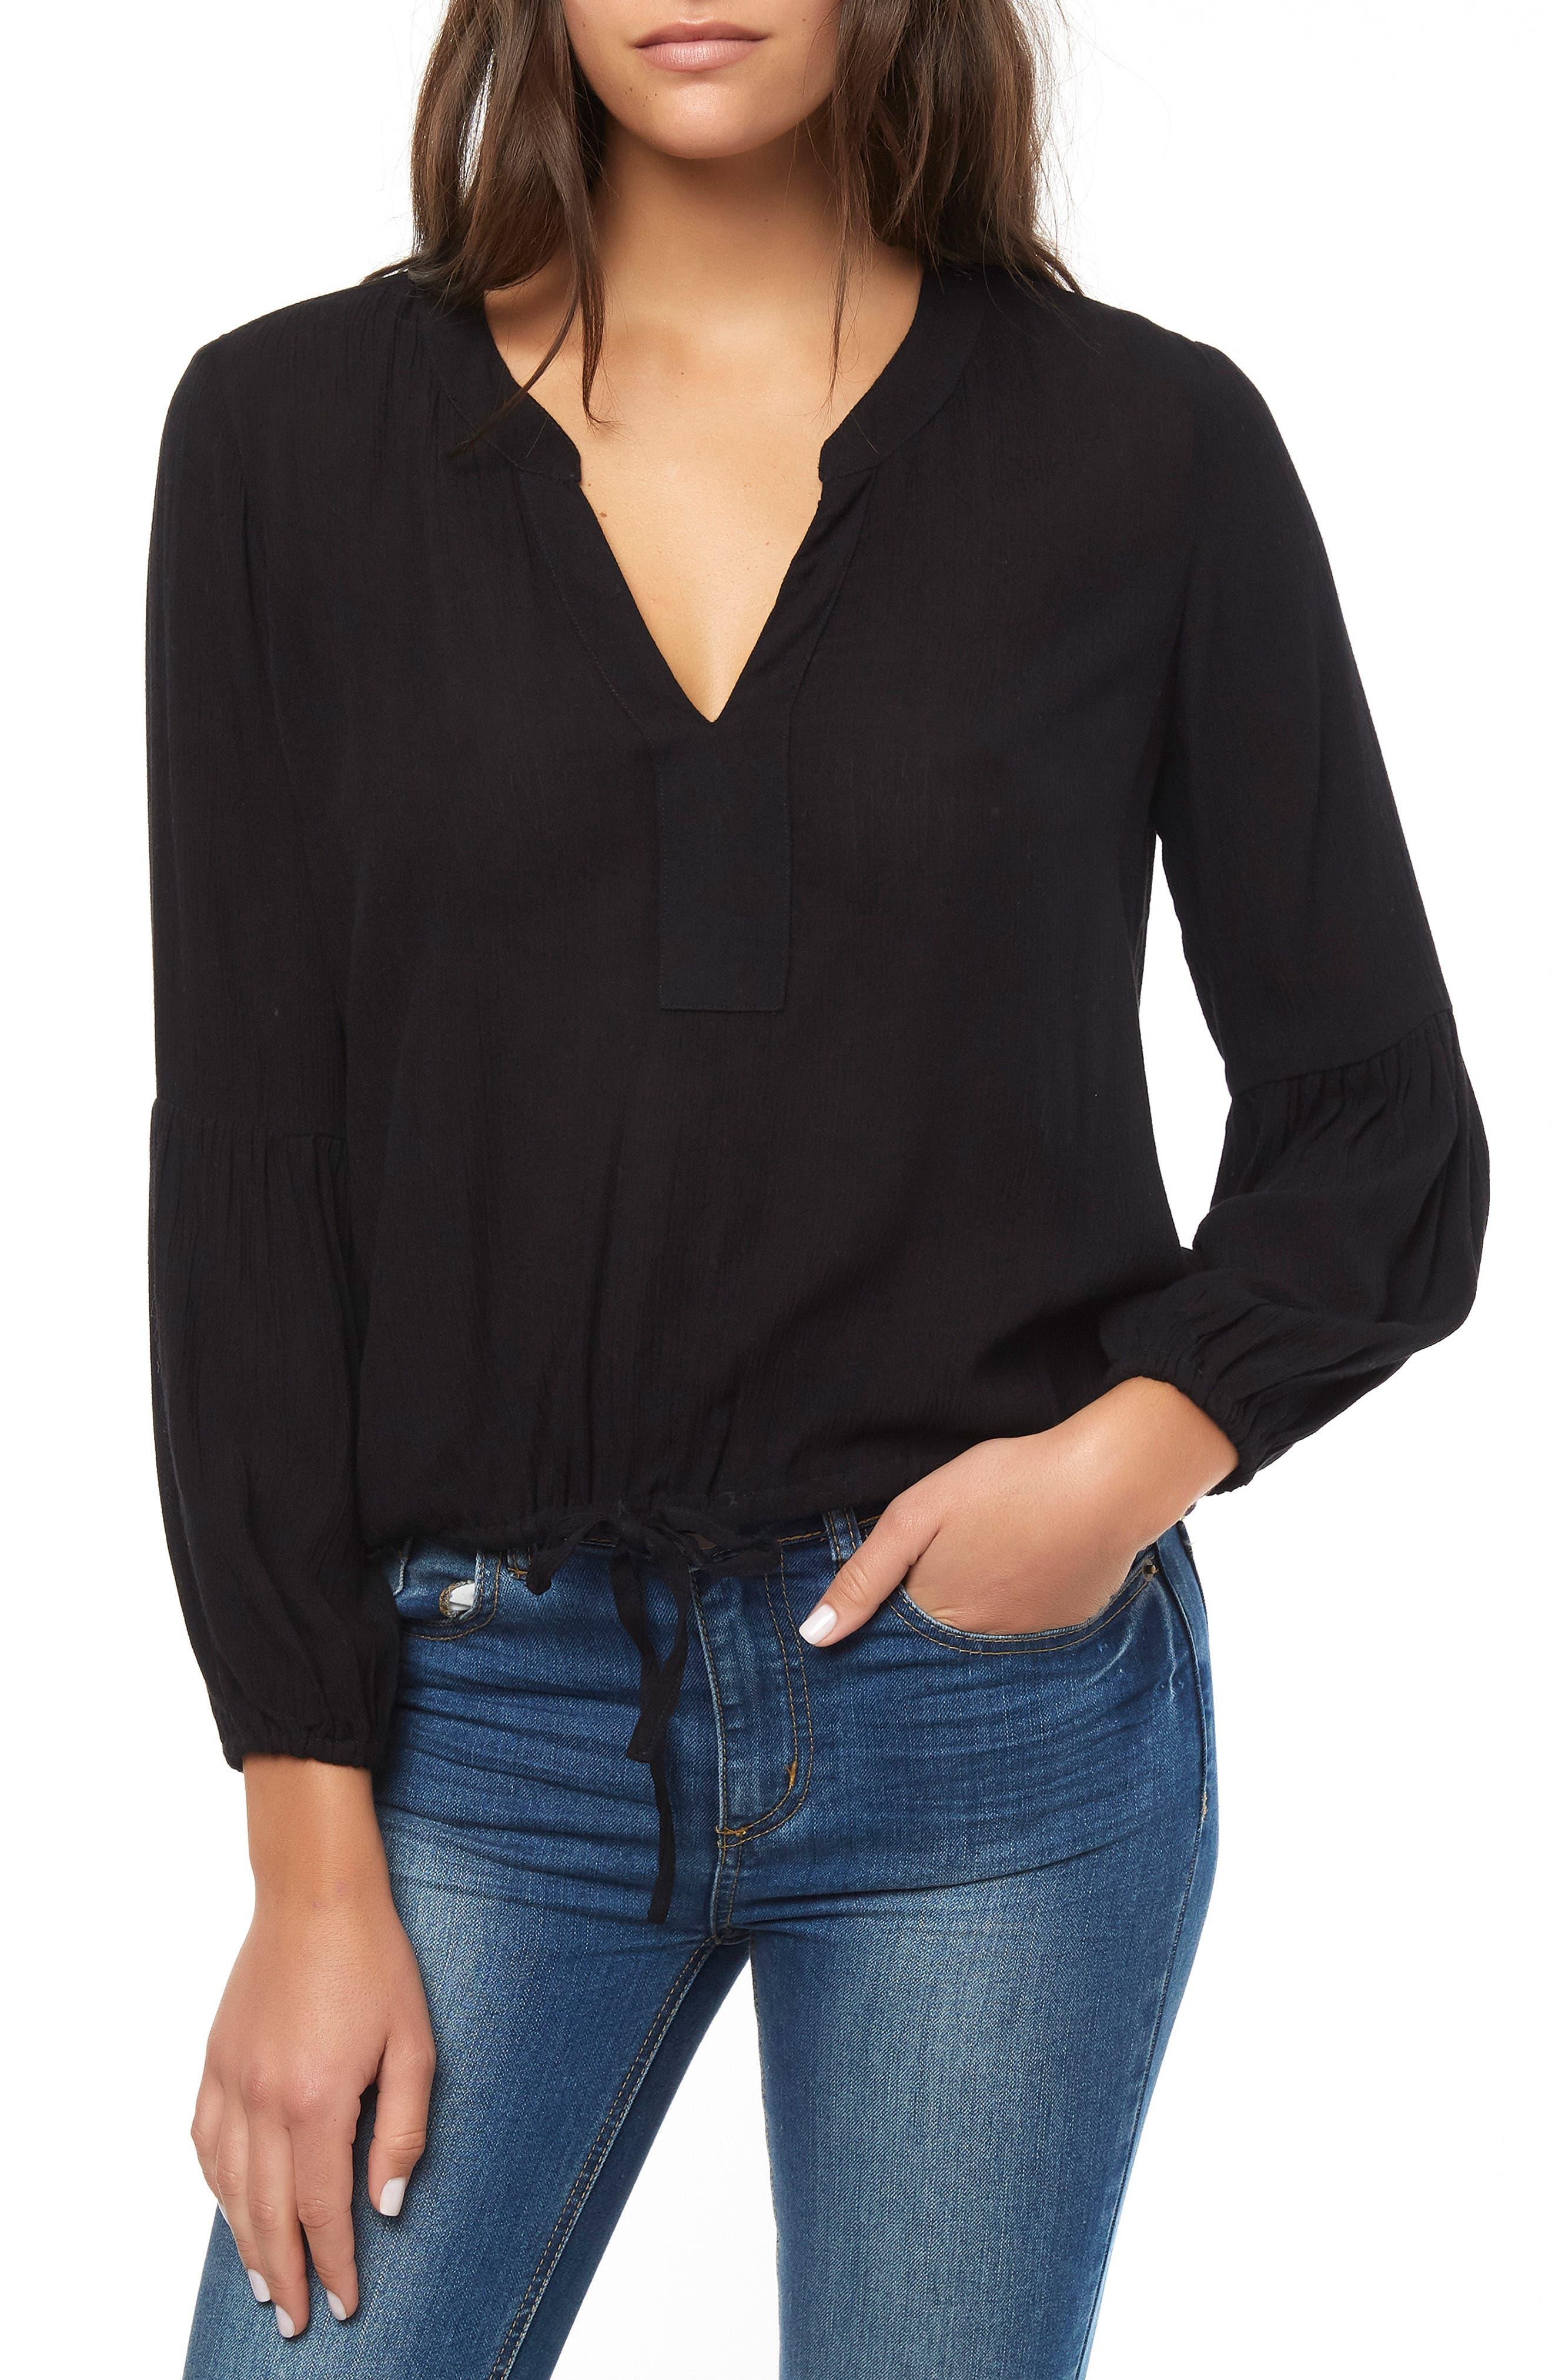 O'NEILL Linette Tie Hem Top, Main, color, BLACK